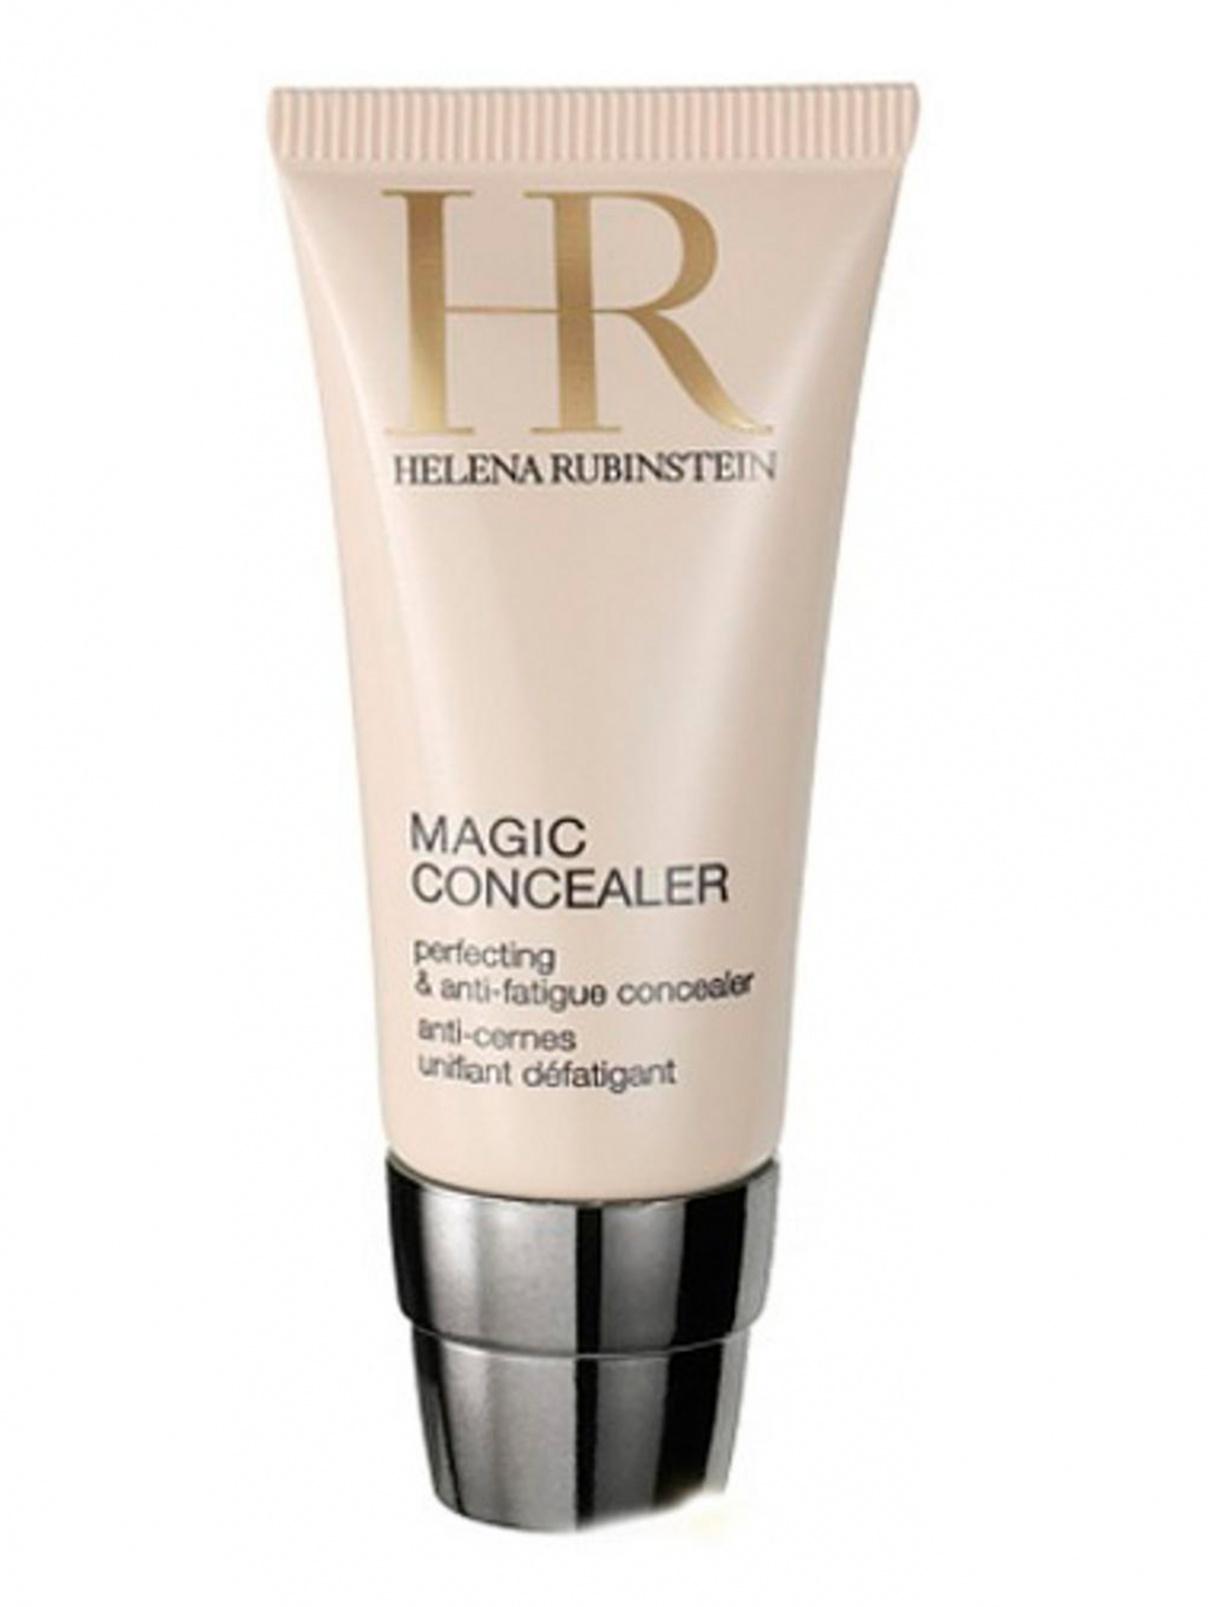 Корректор - №02, Magic Concealer, 15ml Helena Rubinstein  –  Общий вид